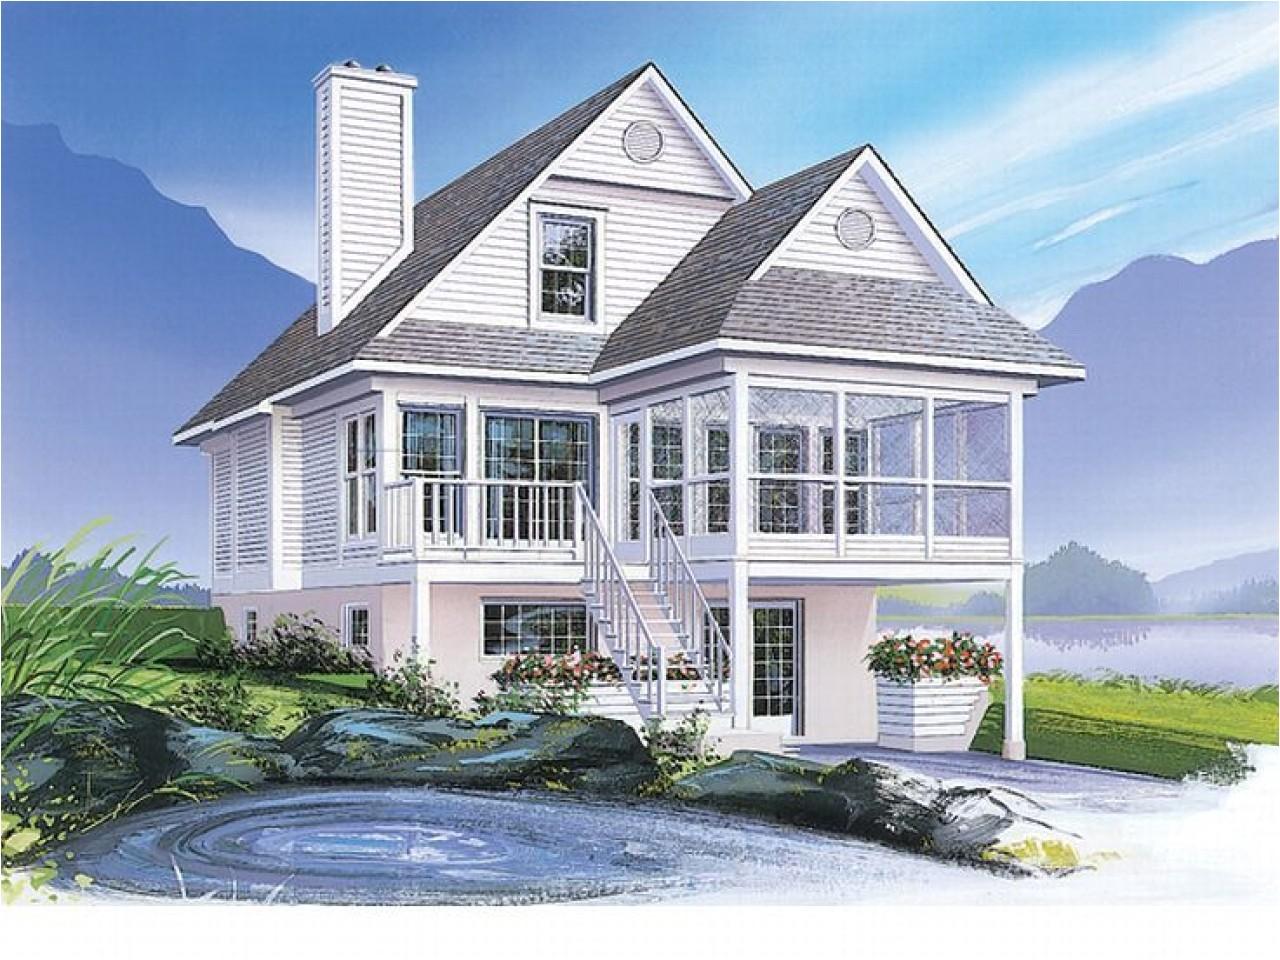 afdb5e2f1ac59192 traditional house plans coastal house plans narrow lots